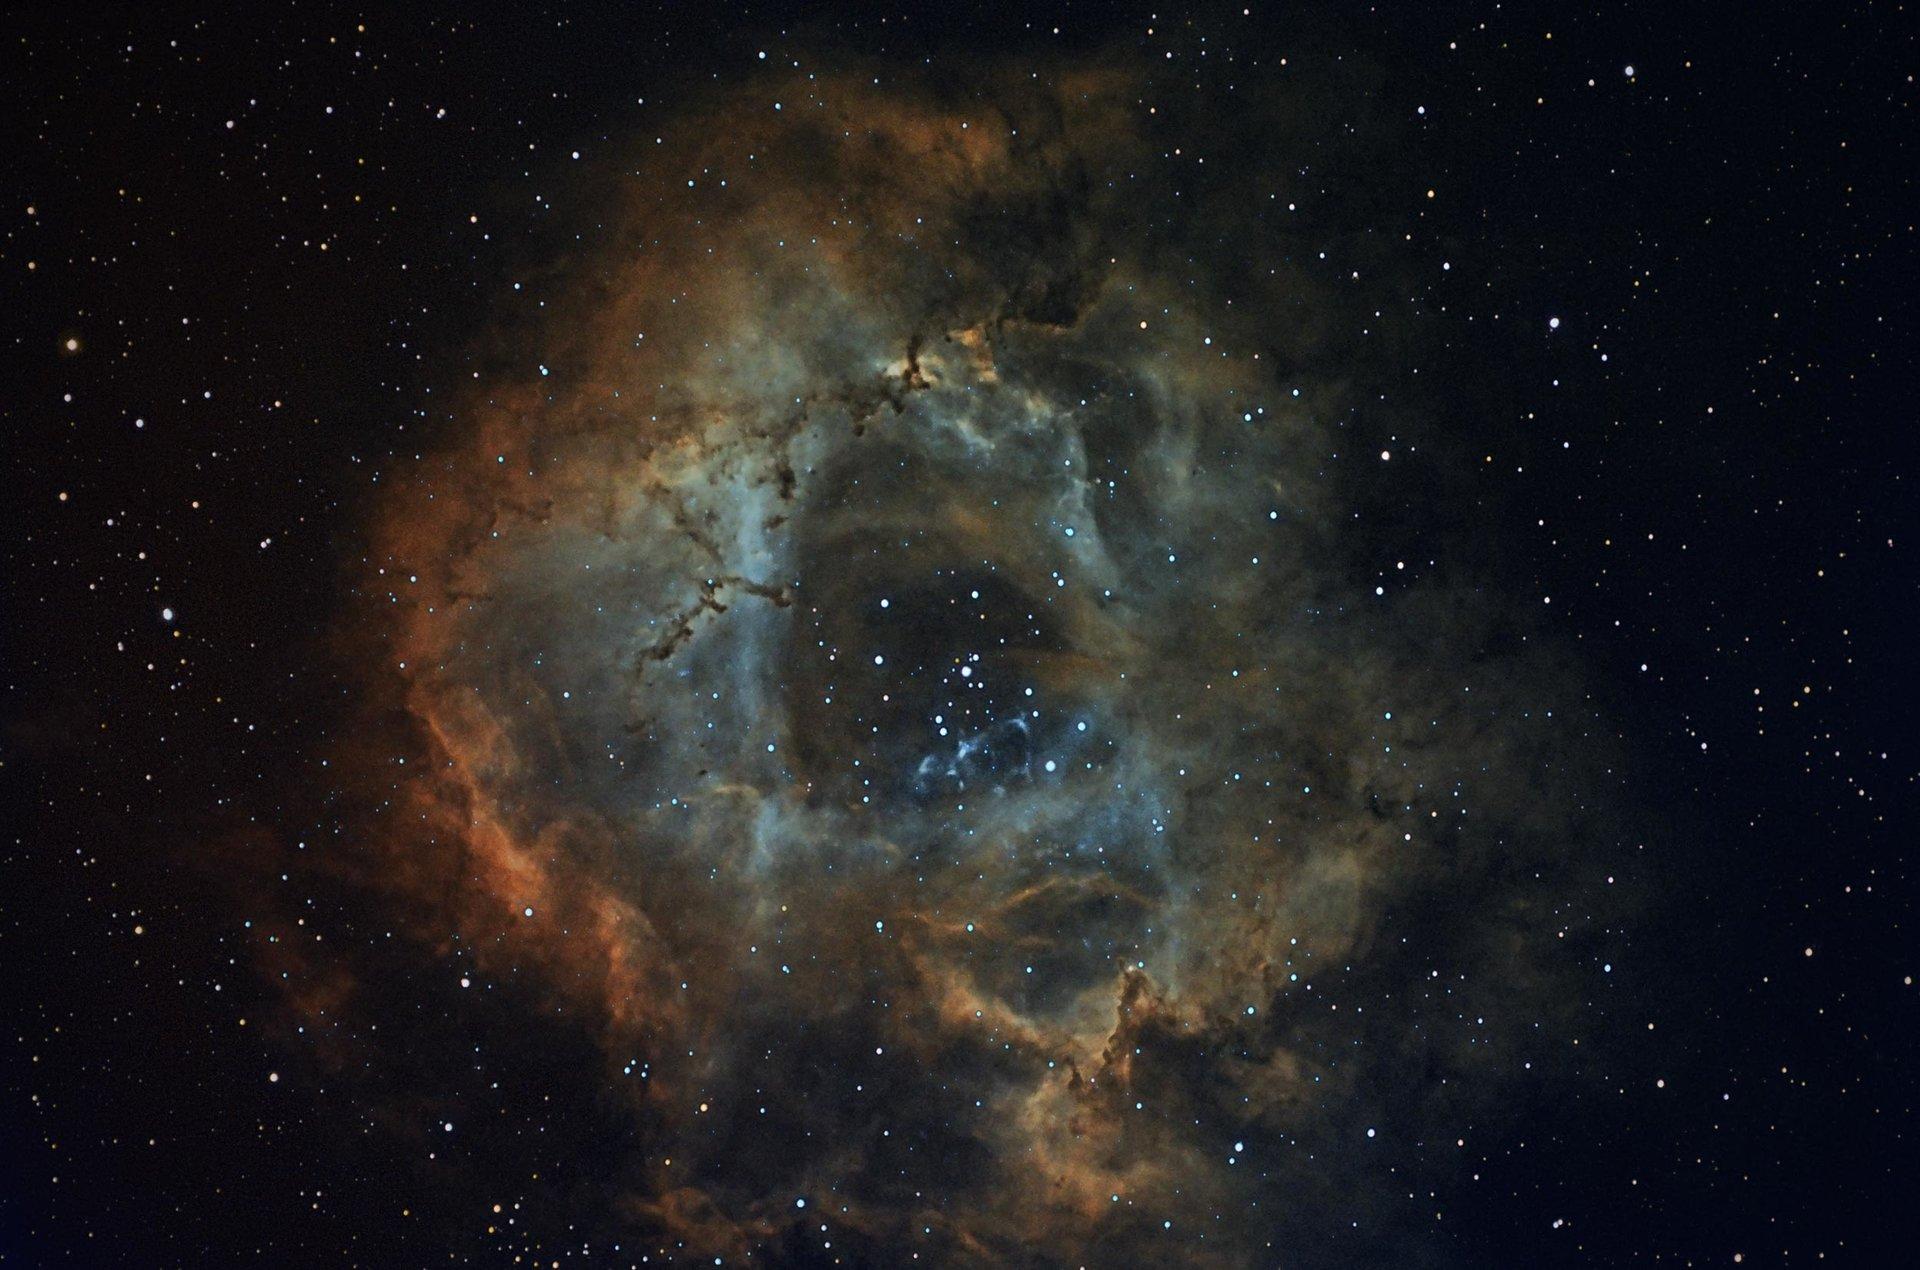 Rosette nebula, Caldwell 49   Author Damyan Ognyanoff - damyan_rm   PHOTO FORUM